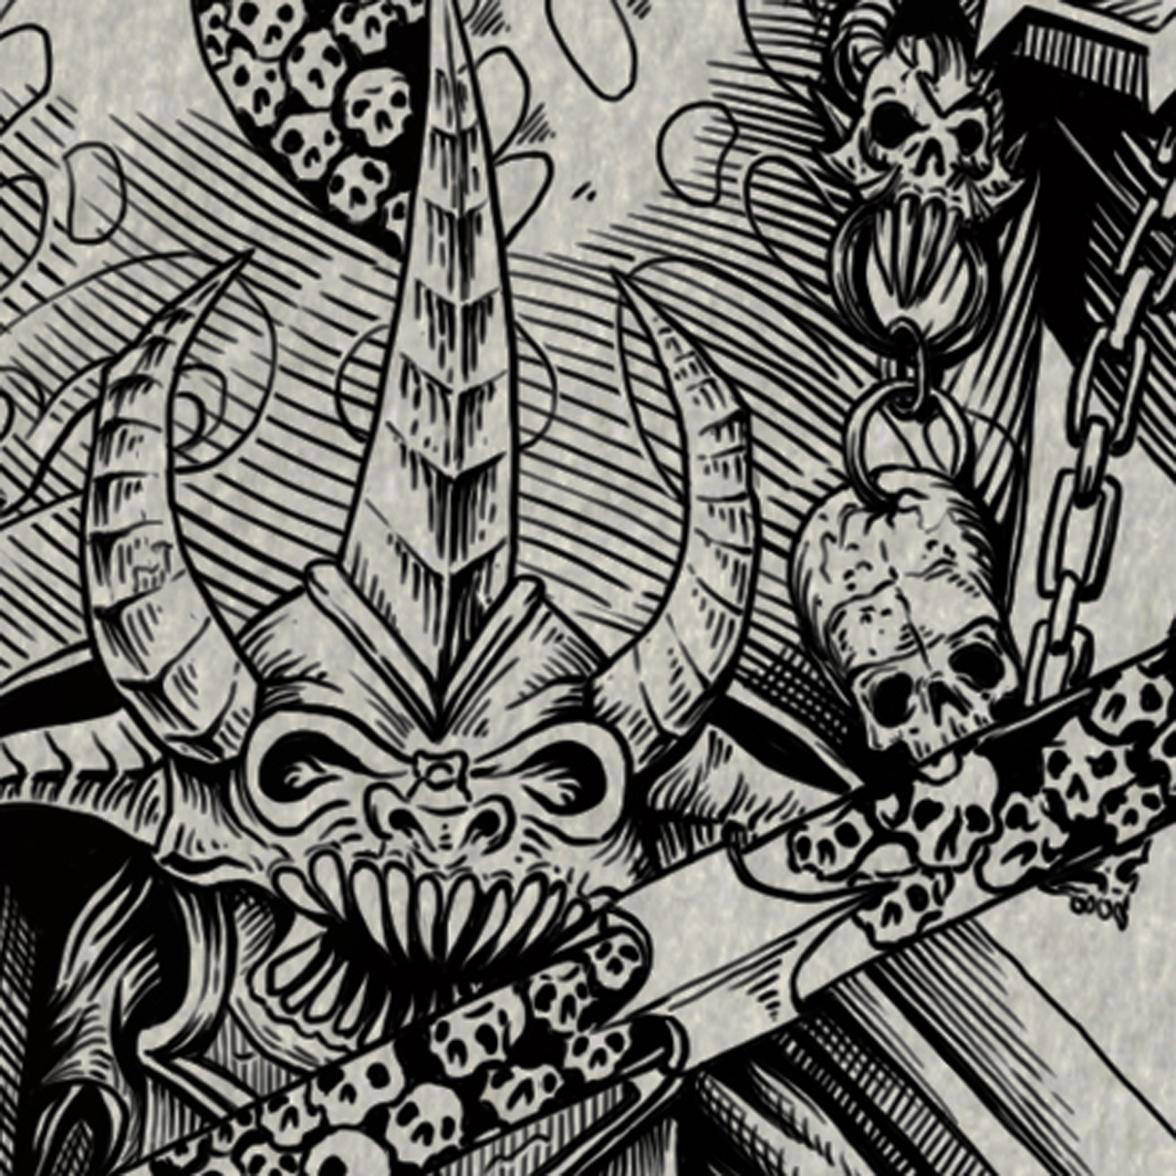 WARHAMMER 40k Khorne (detail)